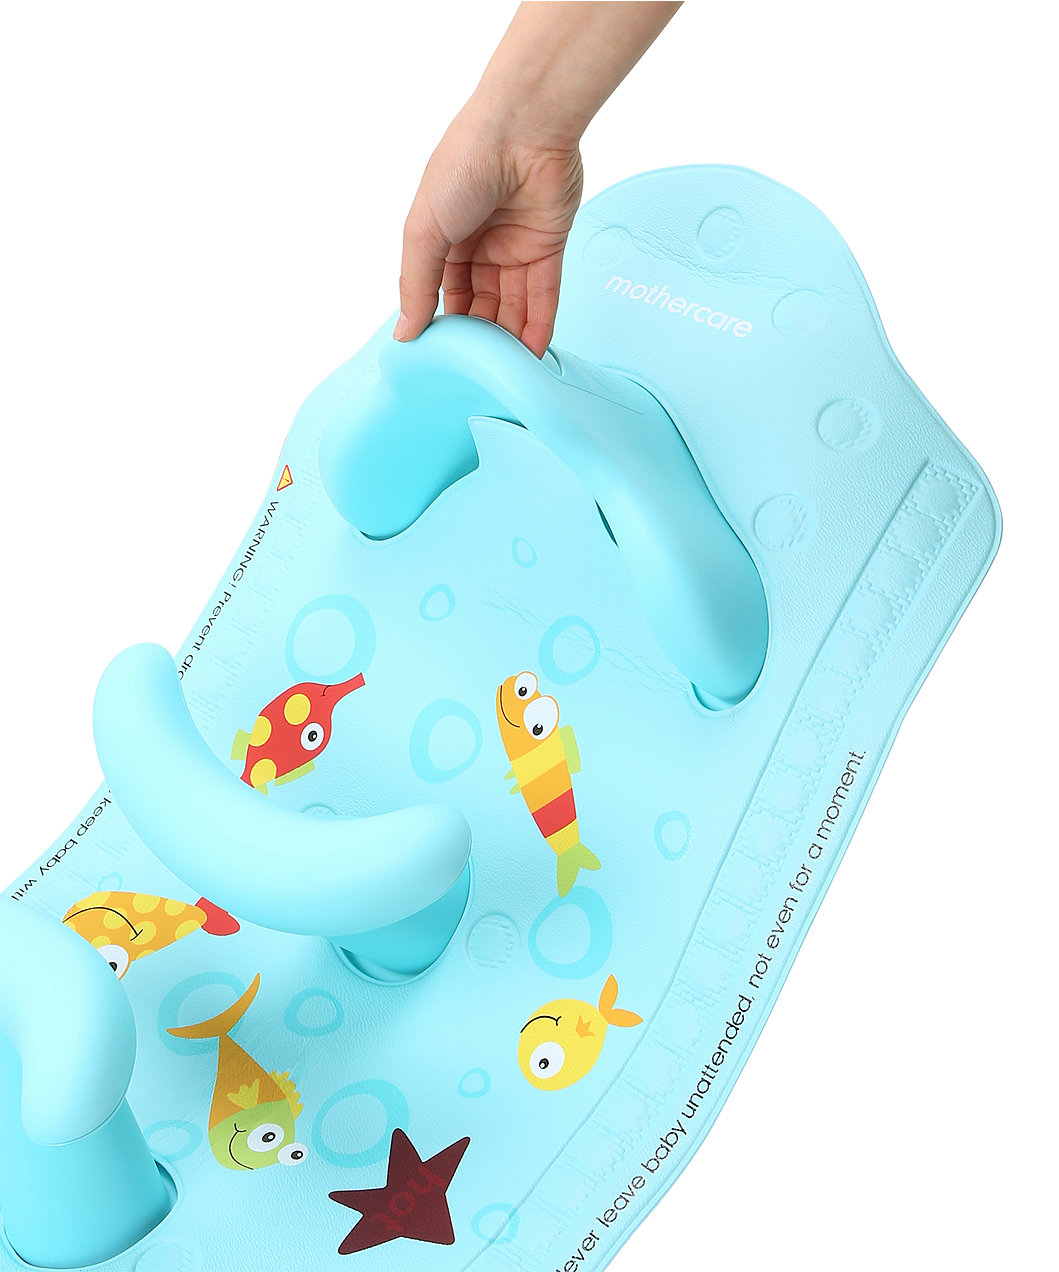 Twin Aqua Pod Buy 2 Get 20 Chicco Baby Moments Bath Foam Soft Cup